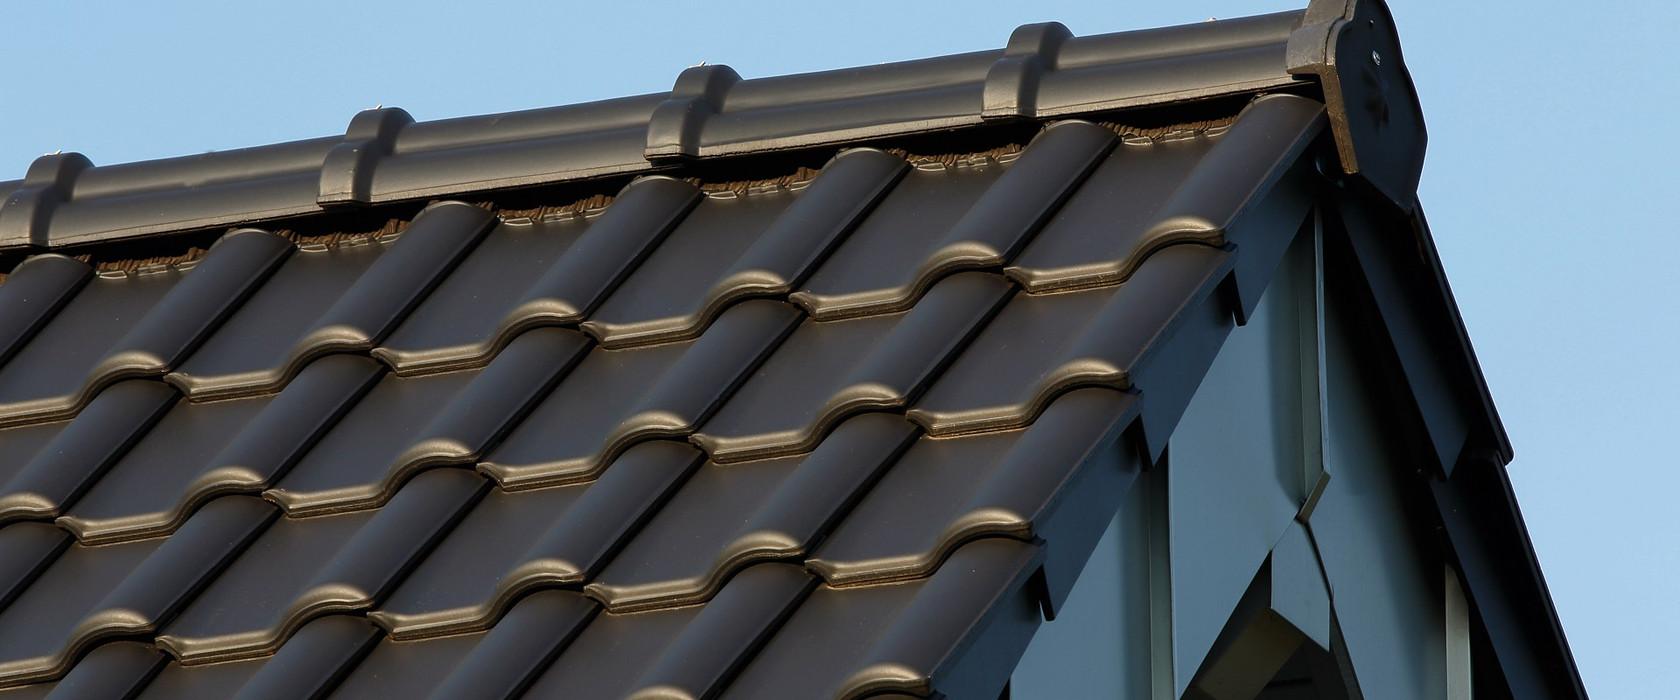 dachowka-ceramiczna-roben